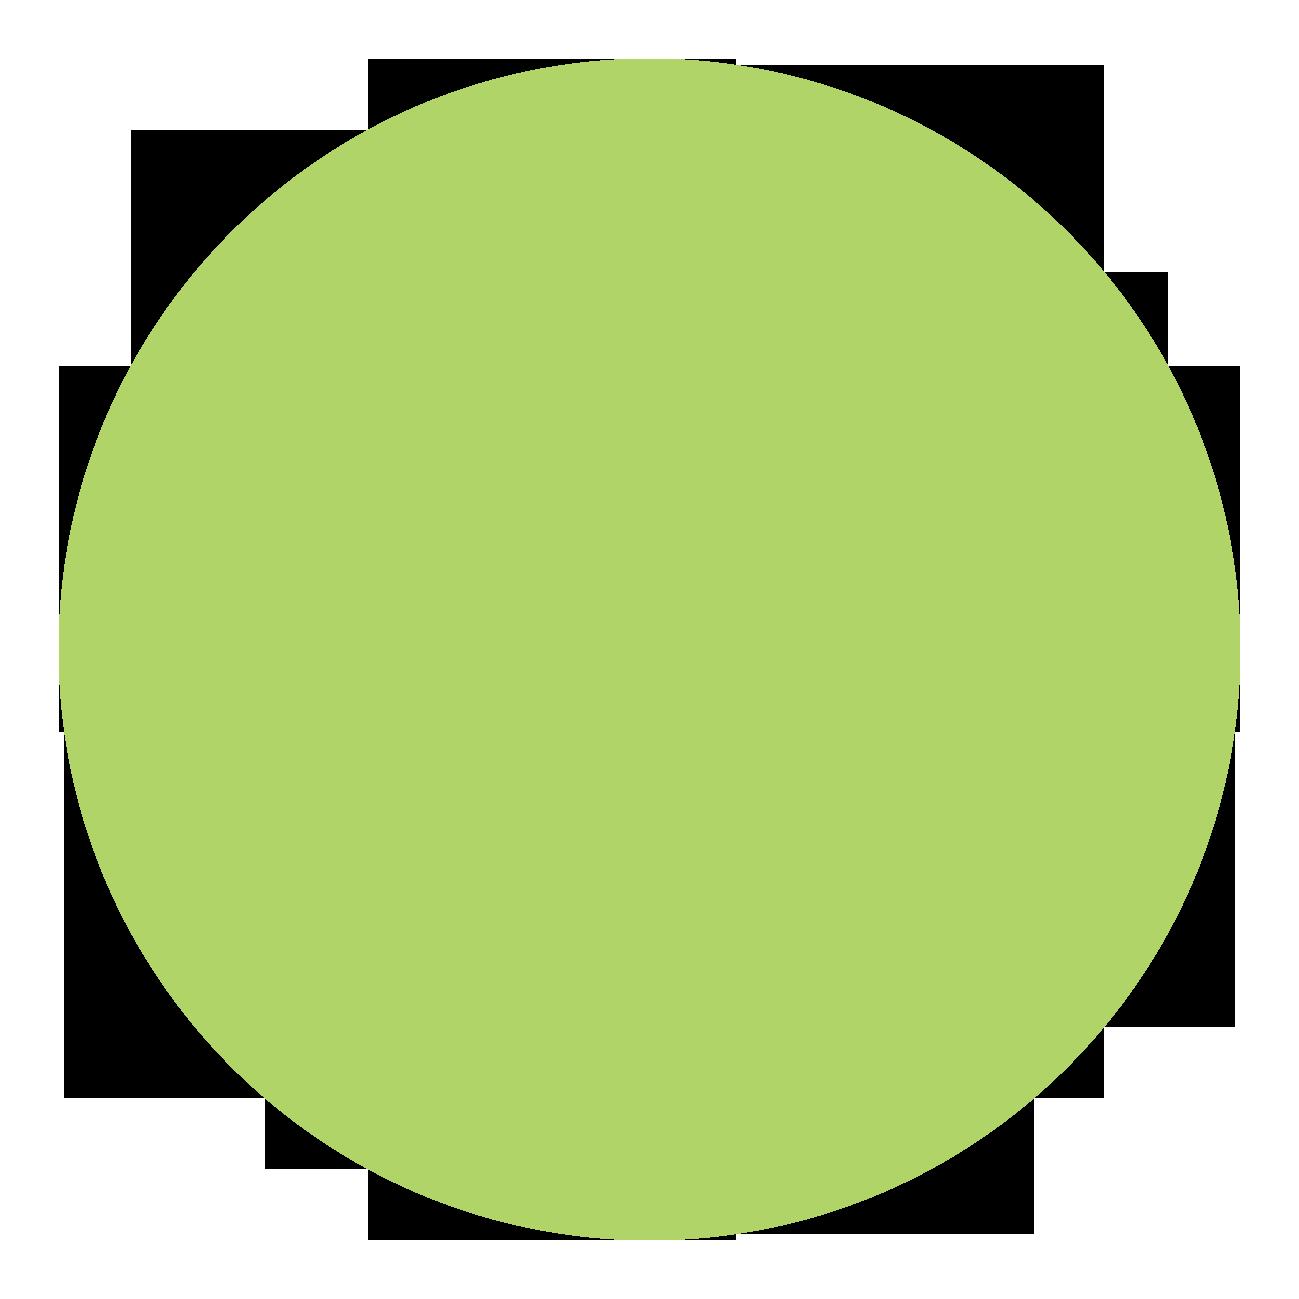 Circle clip art 7